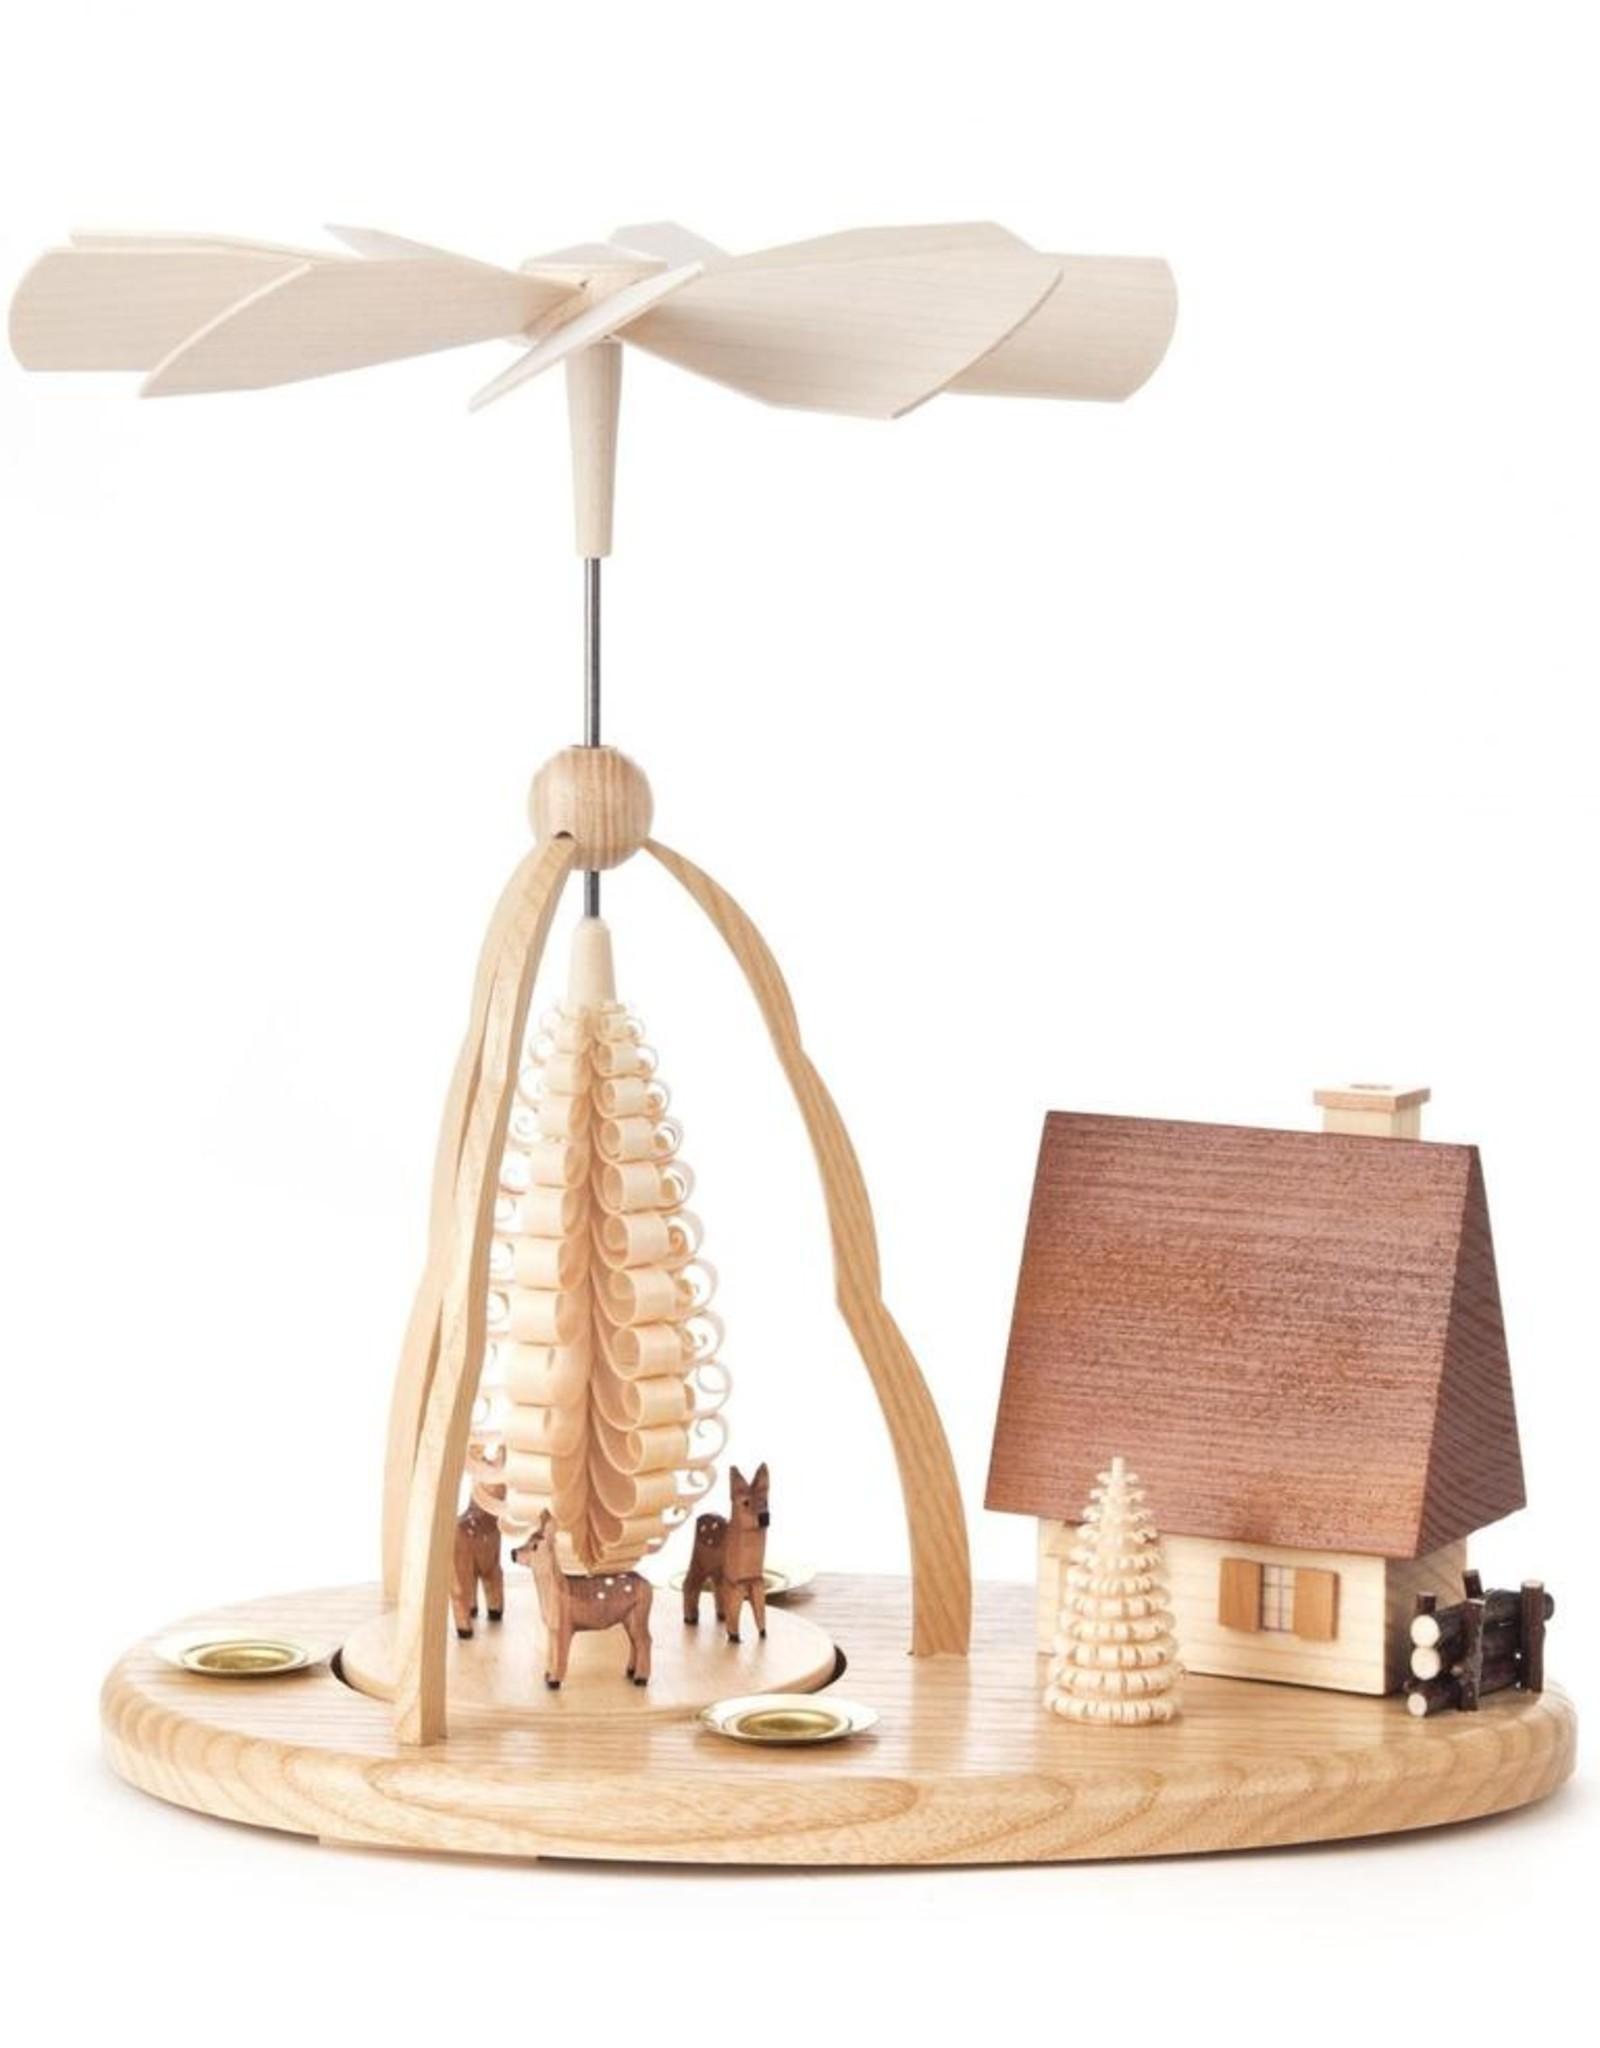 Pyramid w Deer And Smoke (Incense) House. 24cm